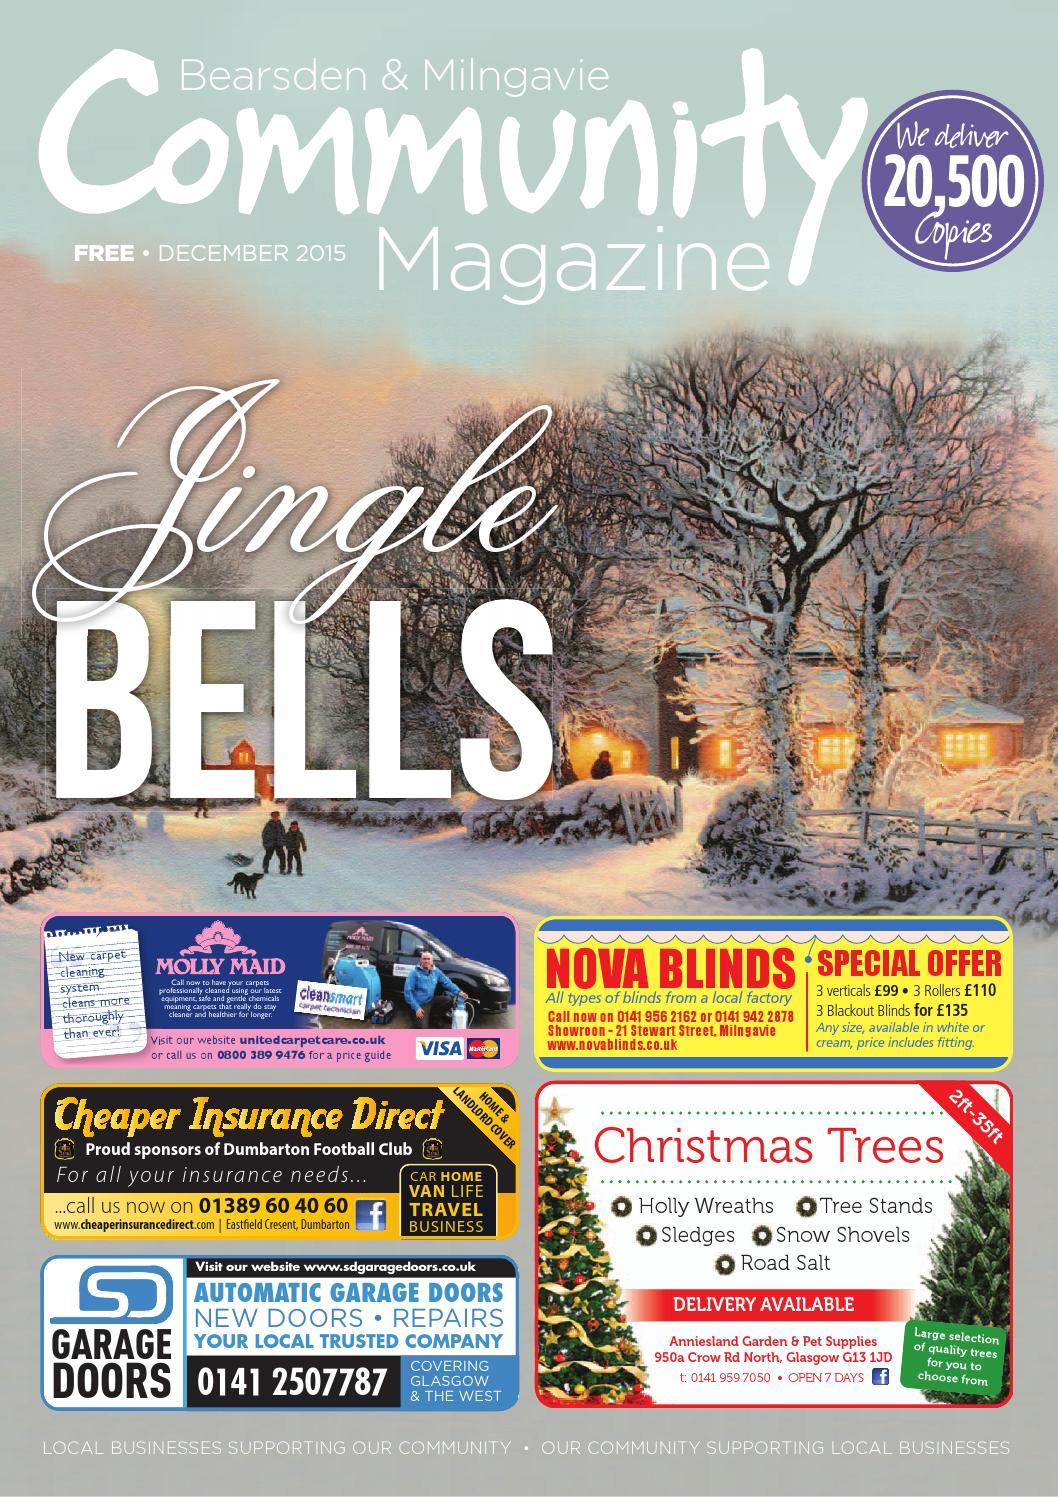 Commag Bea Dec15 Issuu By Community Advertiser Magazine